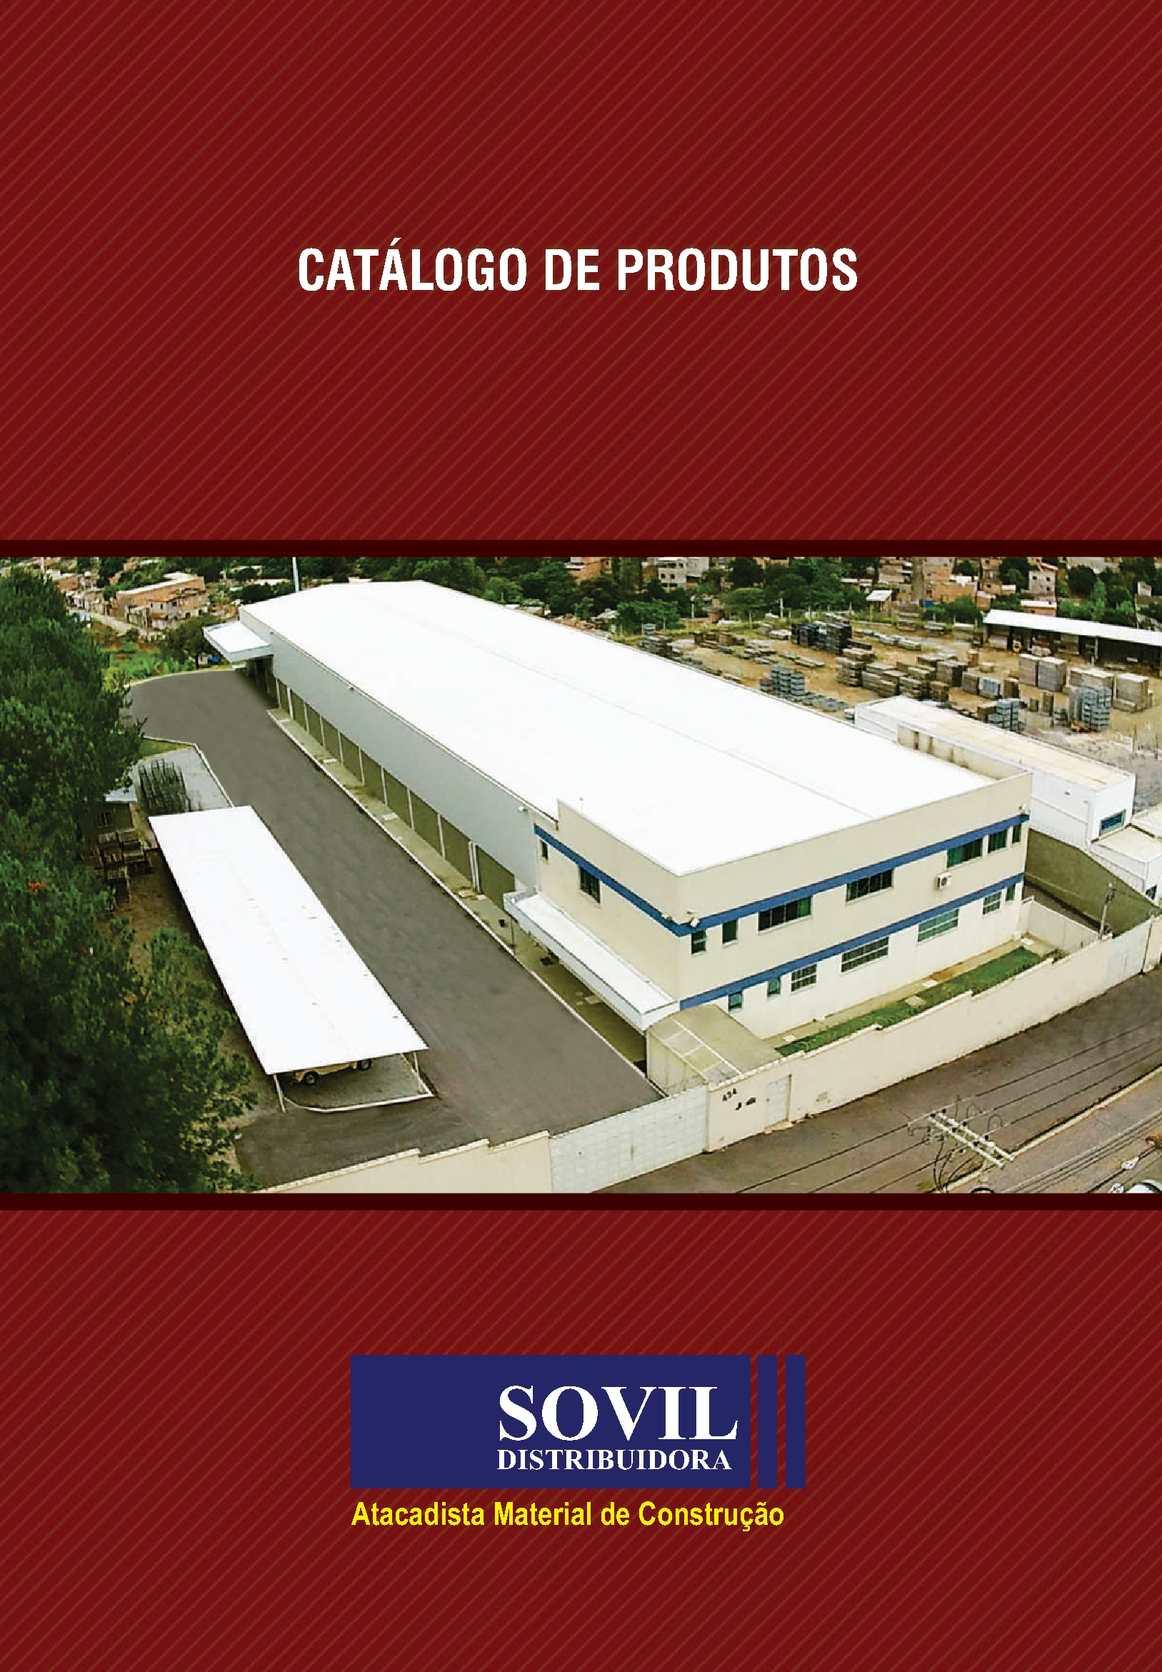 c139d7da5 Calaméo - Catalogo Sovil Distribuidora 2015 Ok